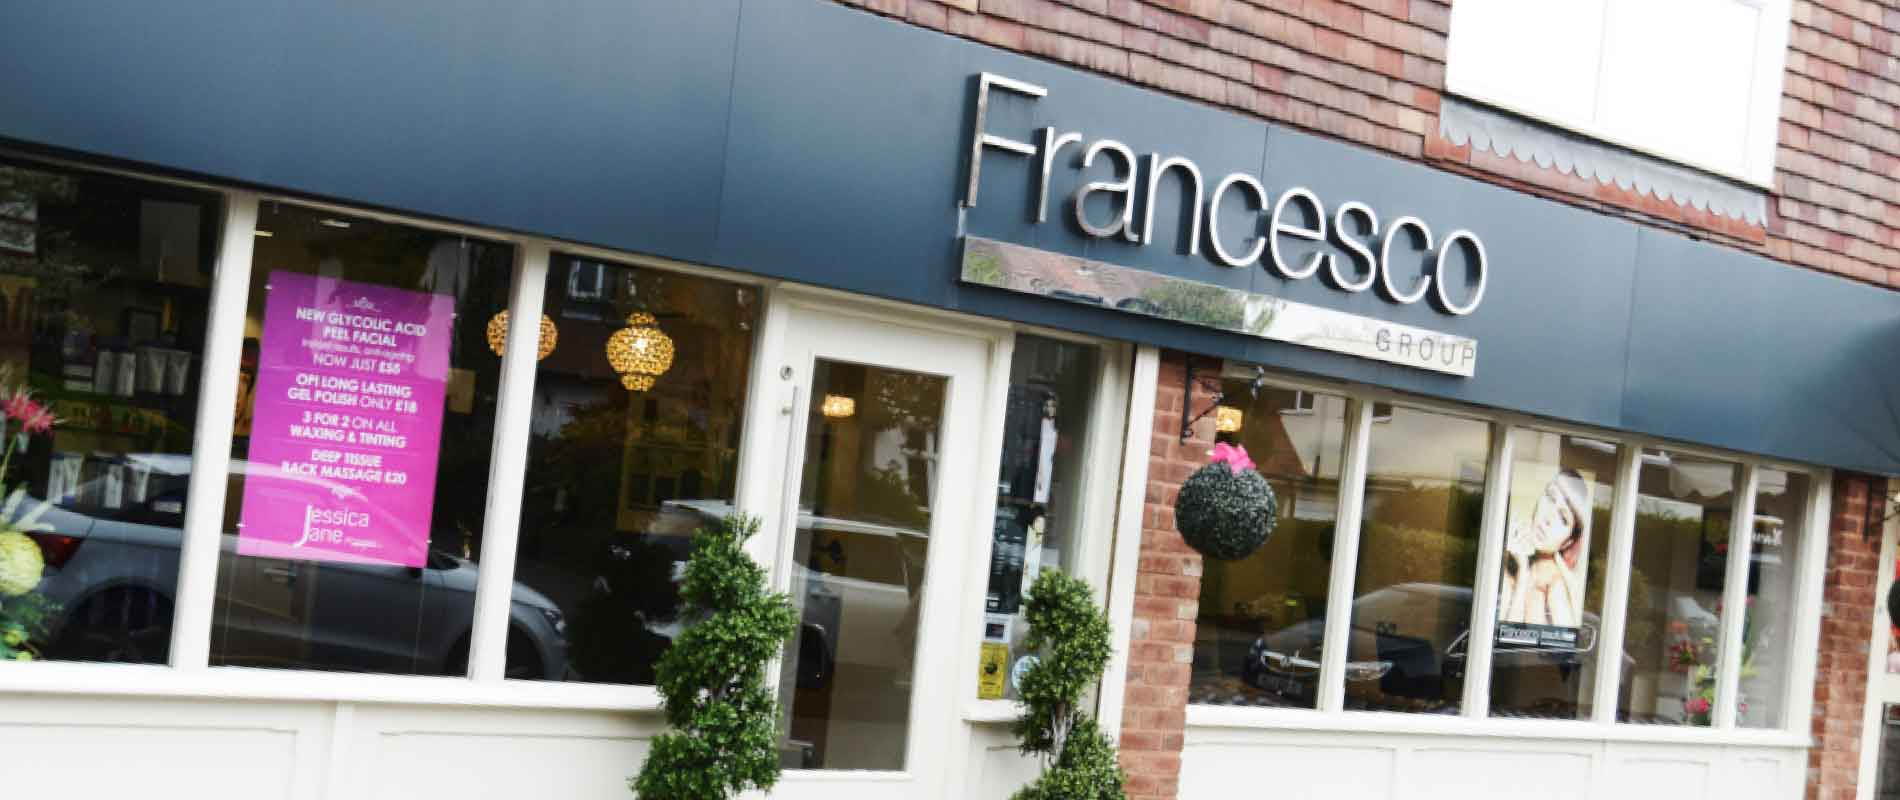 Francesco Group Streetly